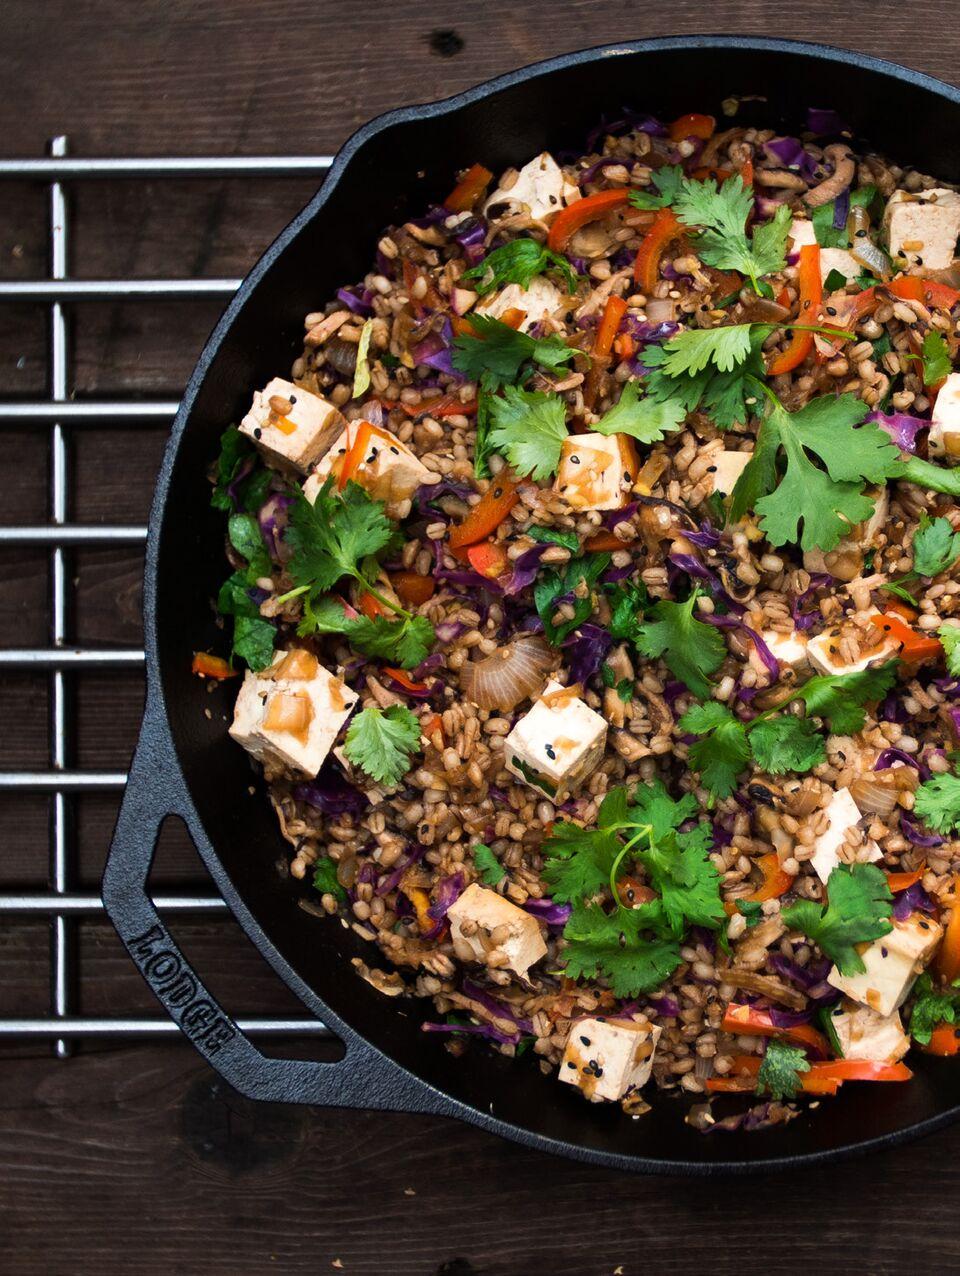 Saag and Tofu Paneer